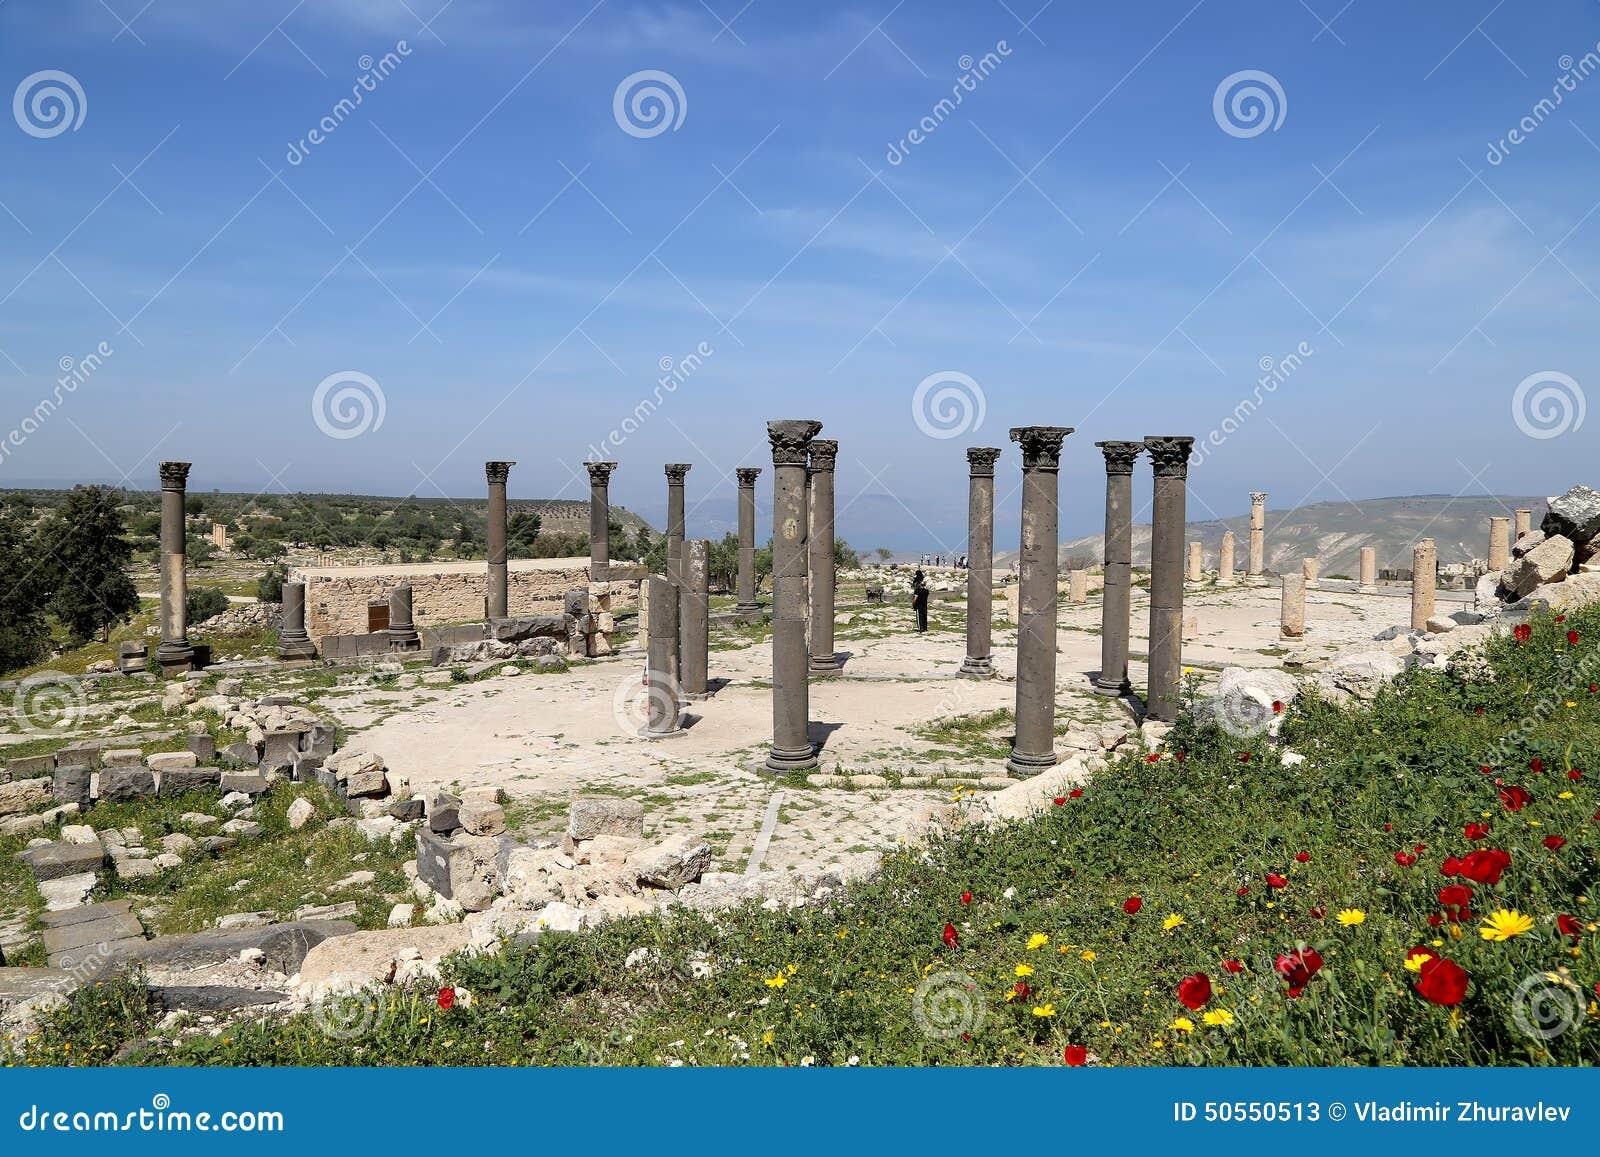 Roman Corinthian Columns In Umm Qais Umm Qays Is A